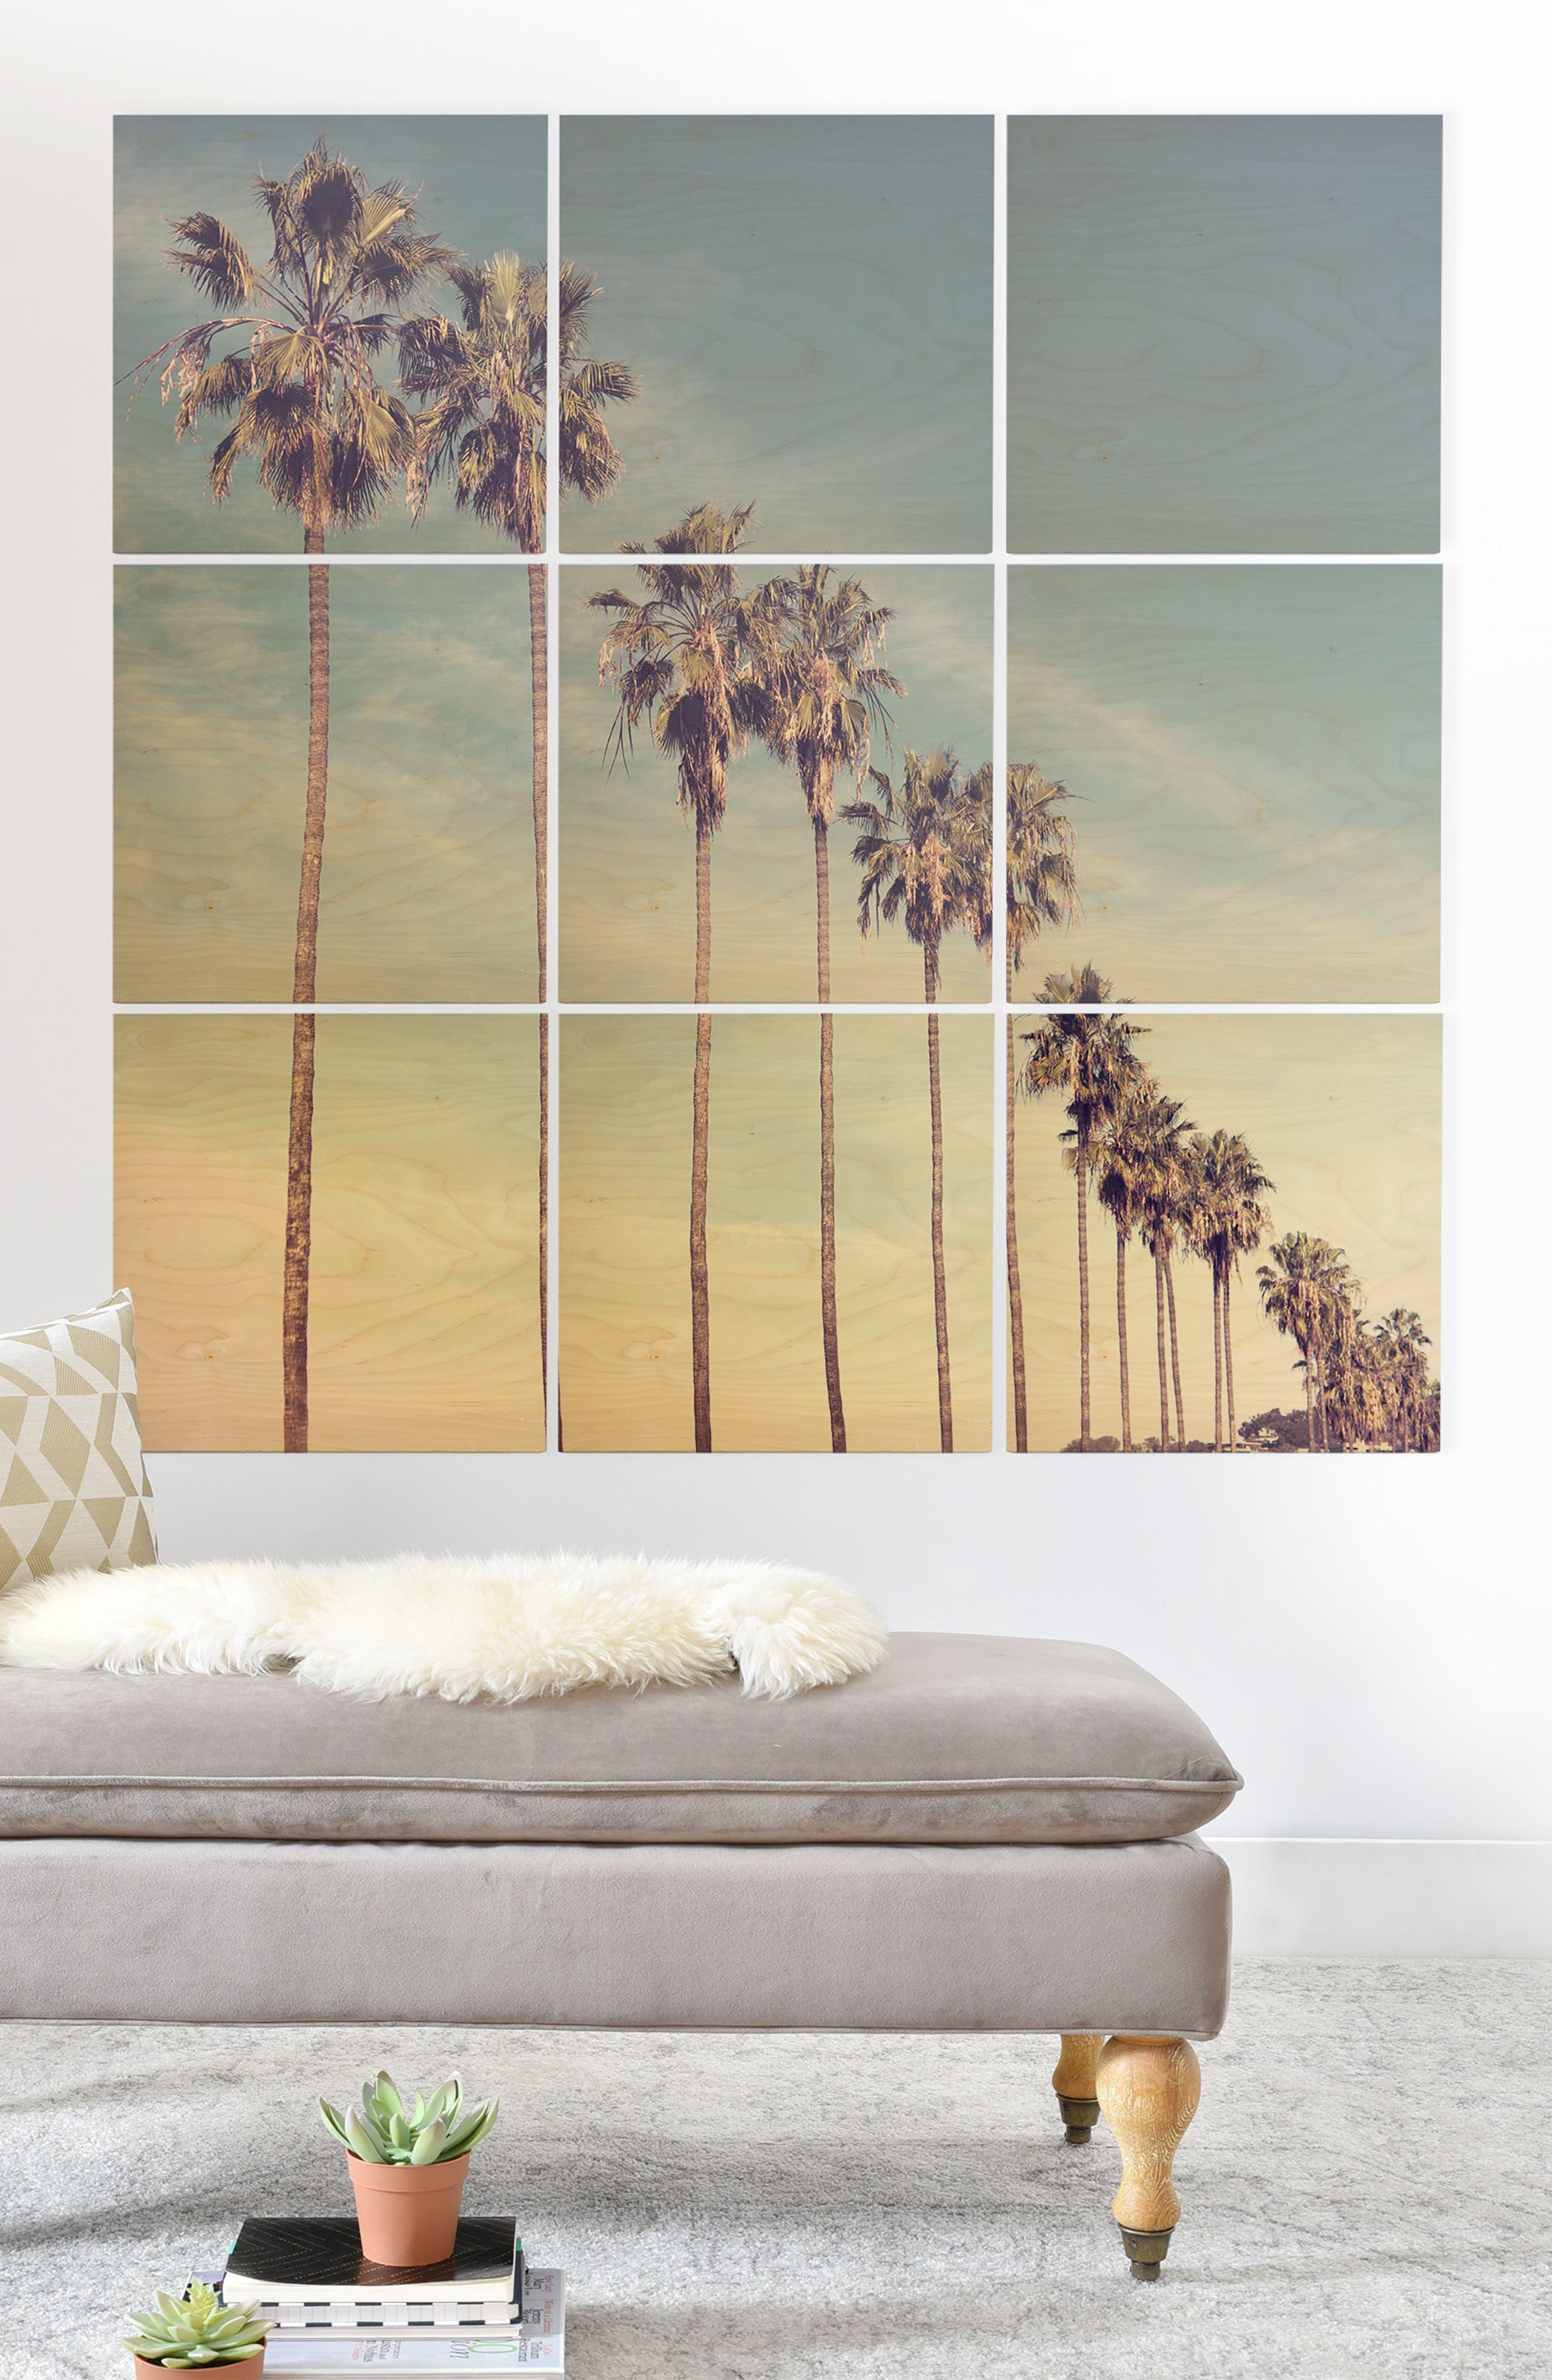 DENY DESIGNS, California Summer 9-Piece Wood Wall Mural, Alternate thumbnail 2, color, BLUE